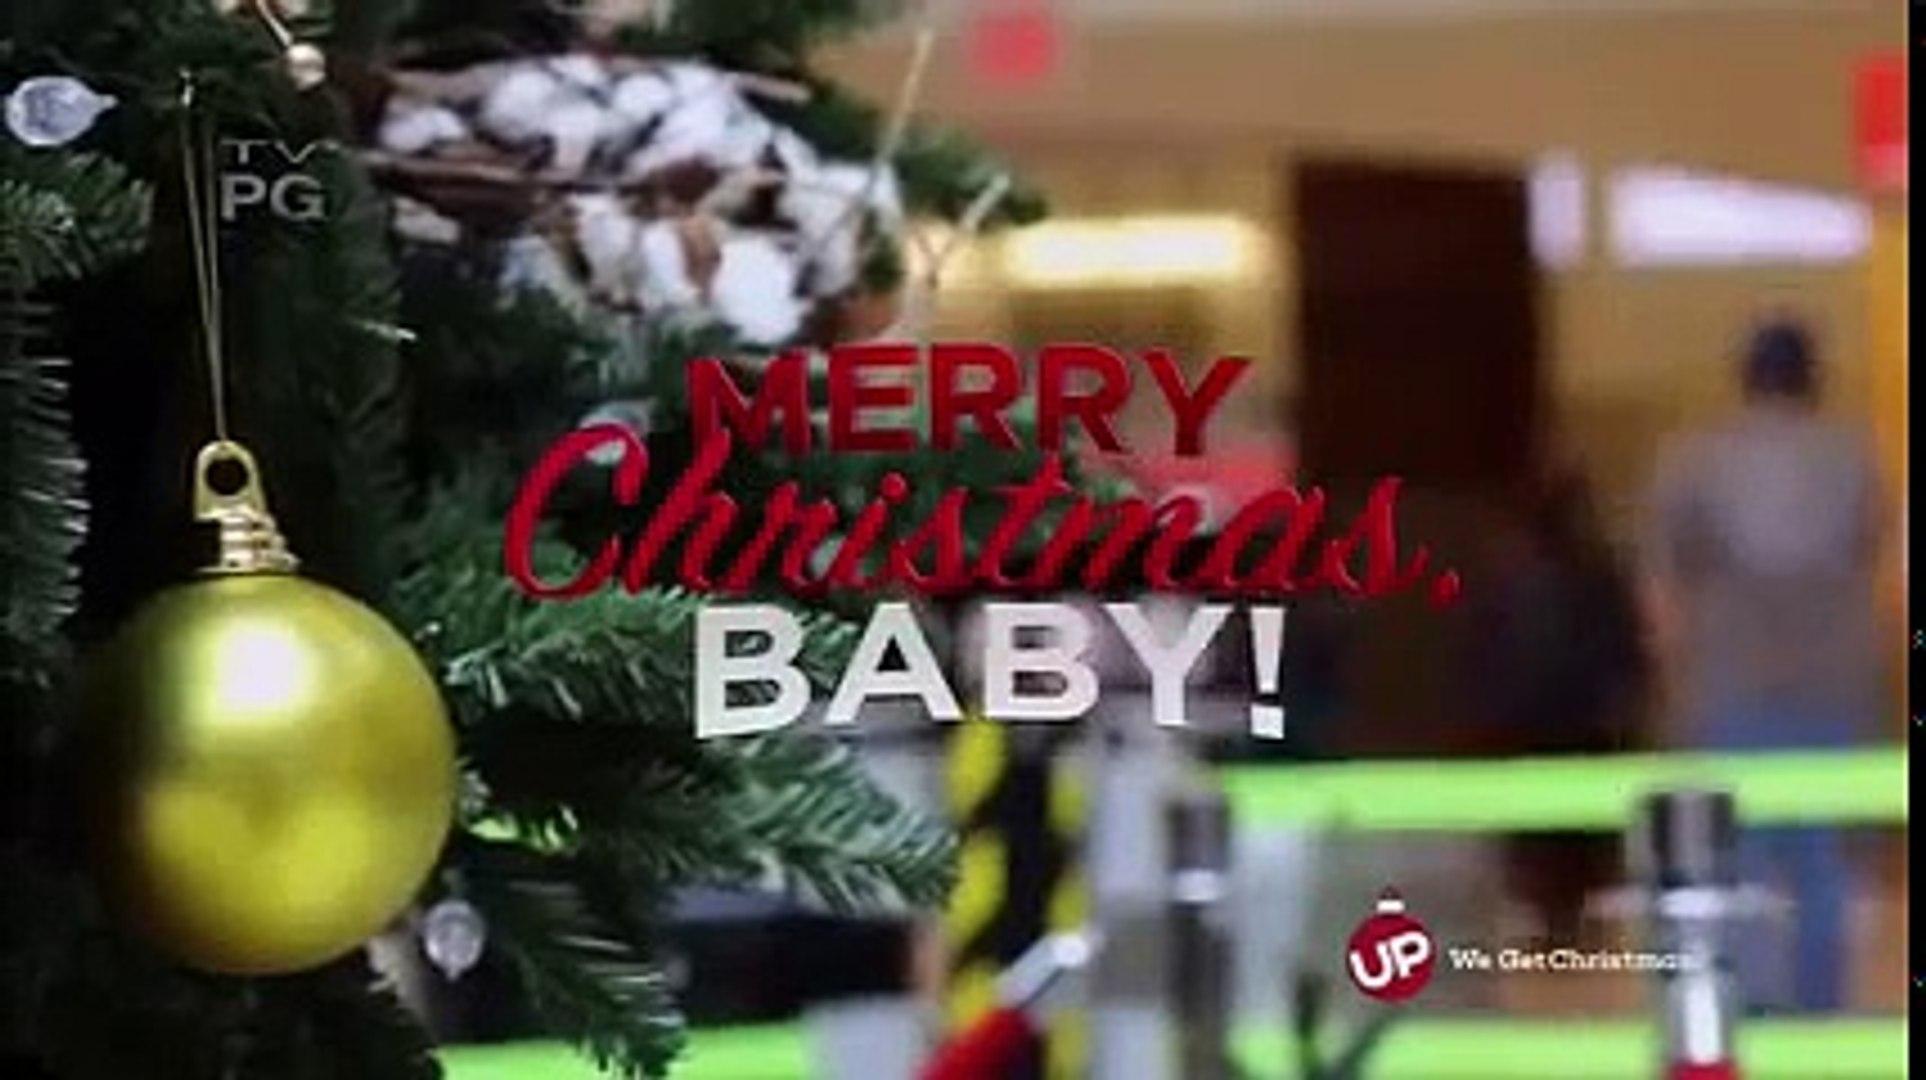 Hallmark Christmas Movie 2016 / Hallmark Merry Christmas, Baby 2016 / Lifetime Movie 2016 part 1/2